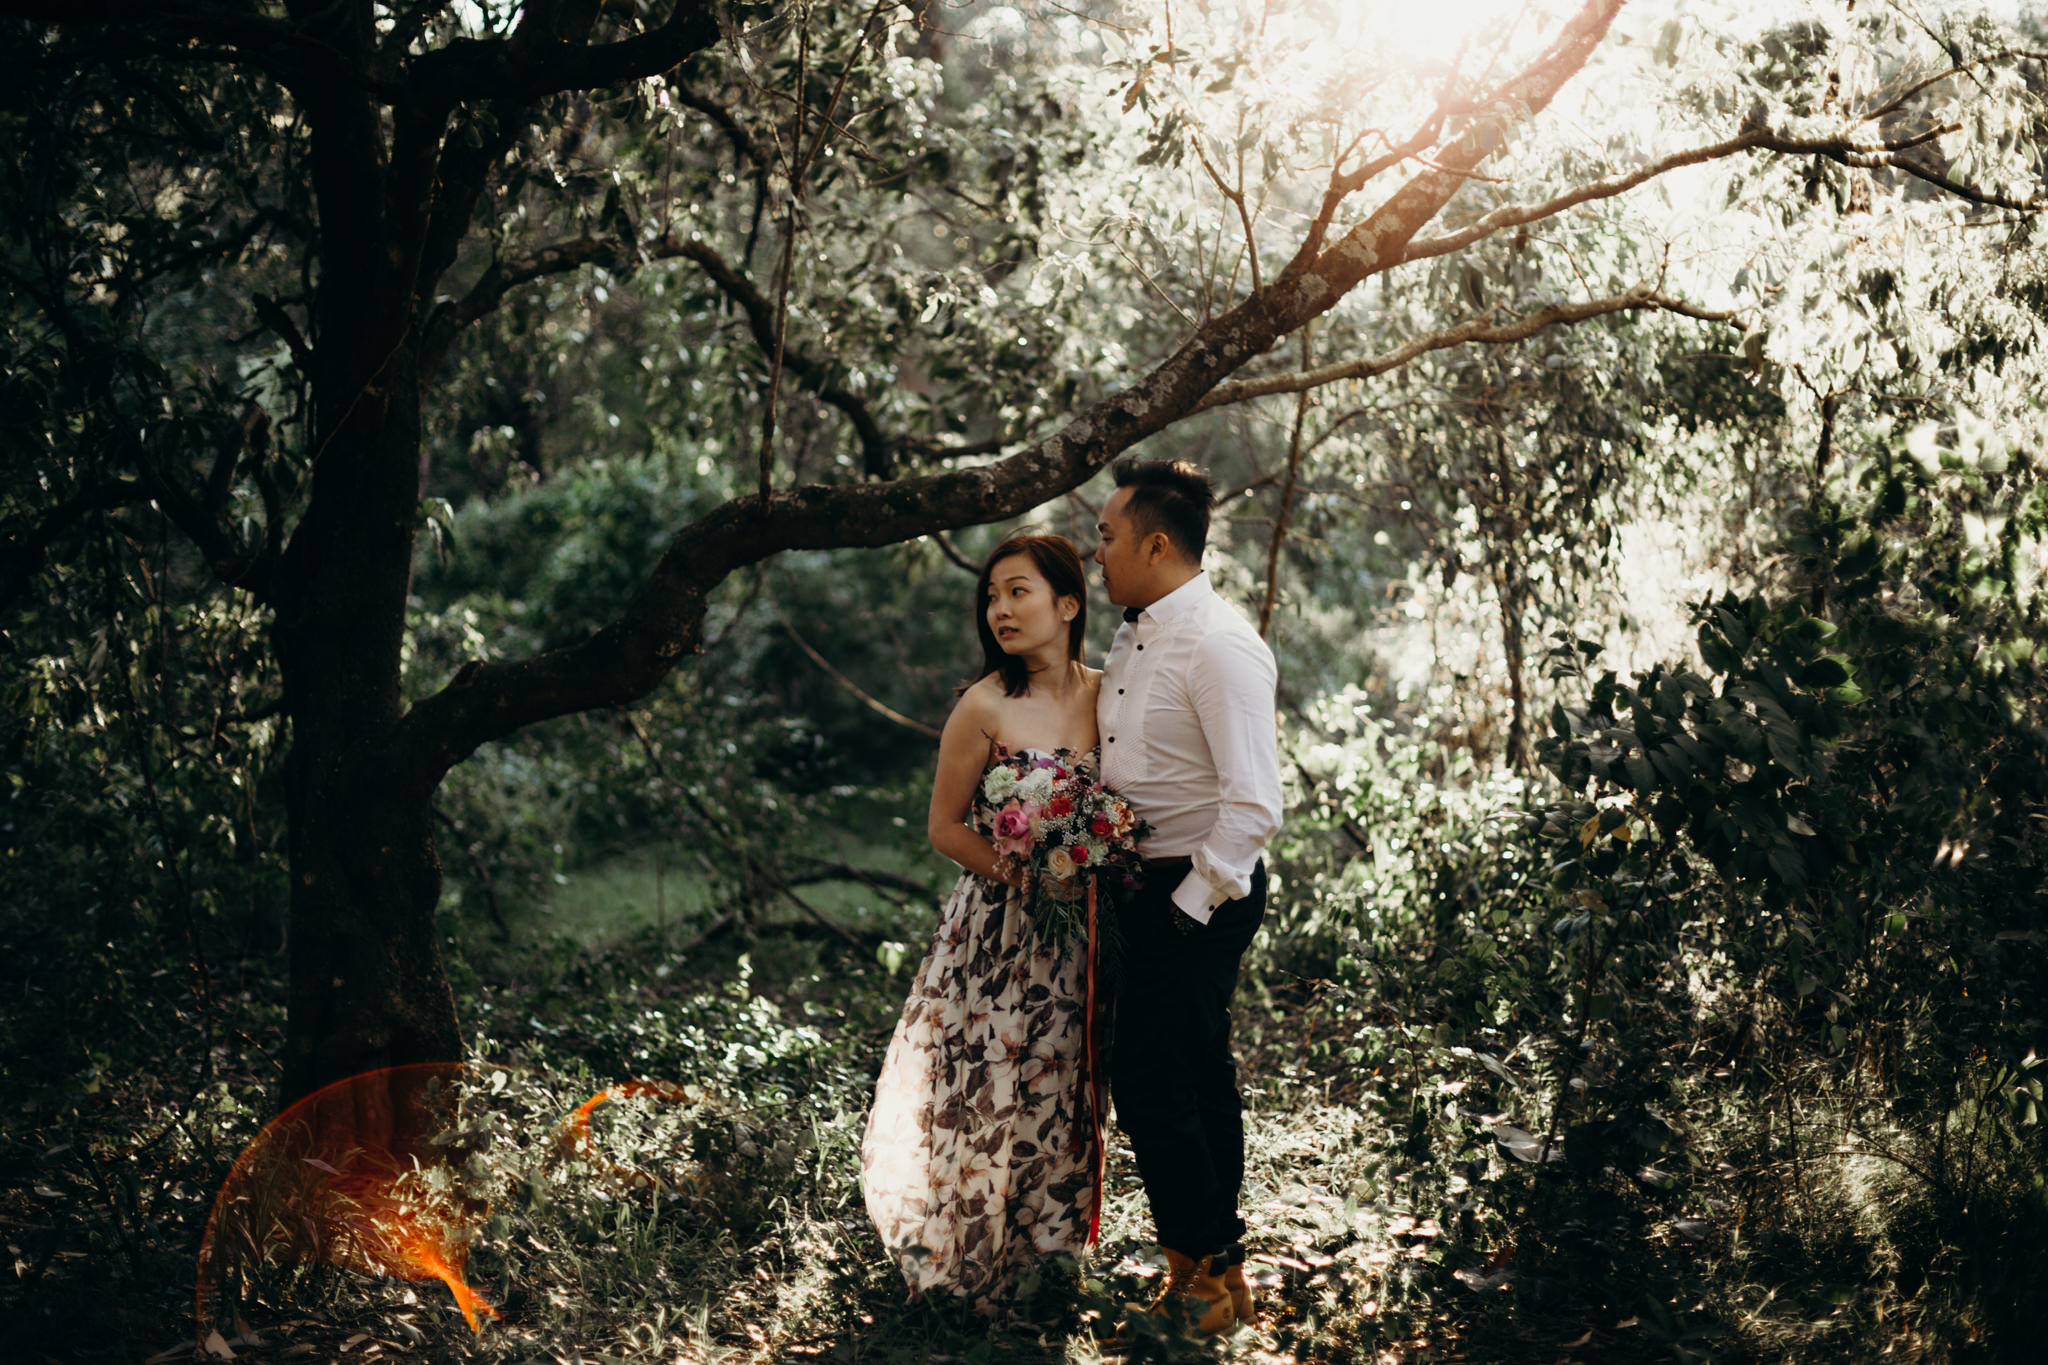 Fox & Kin Destination Wedding Photographer Intimate Elopement Sydney Byron Coffs Harbour Photography Nicola Bodle